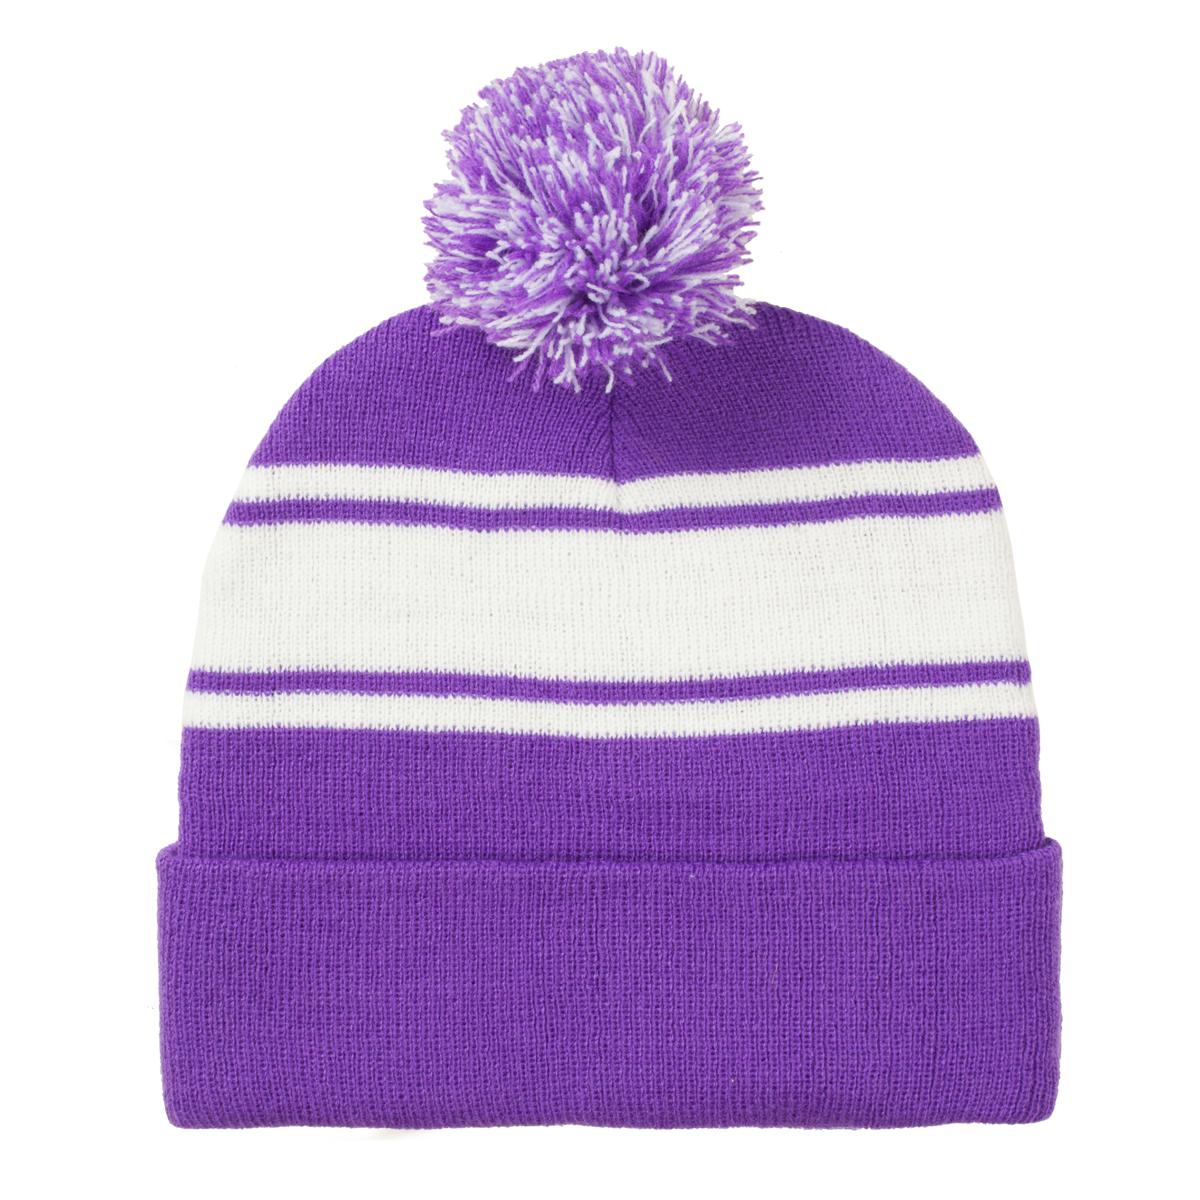 1097_purple.jpg